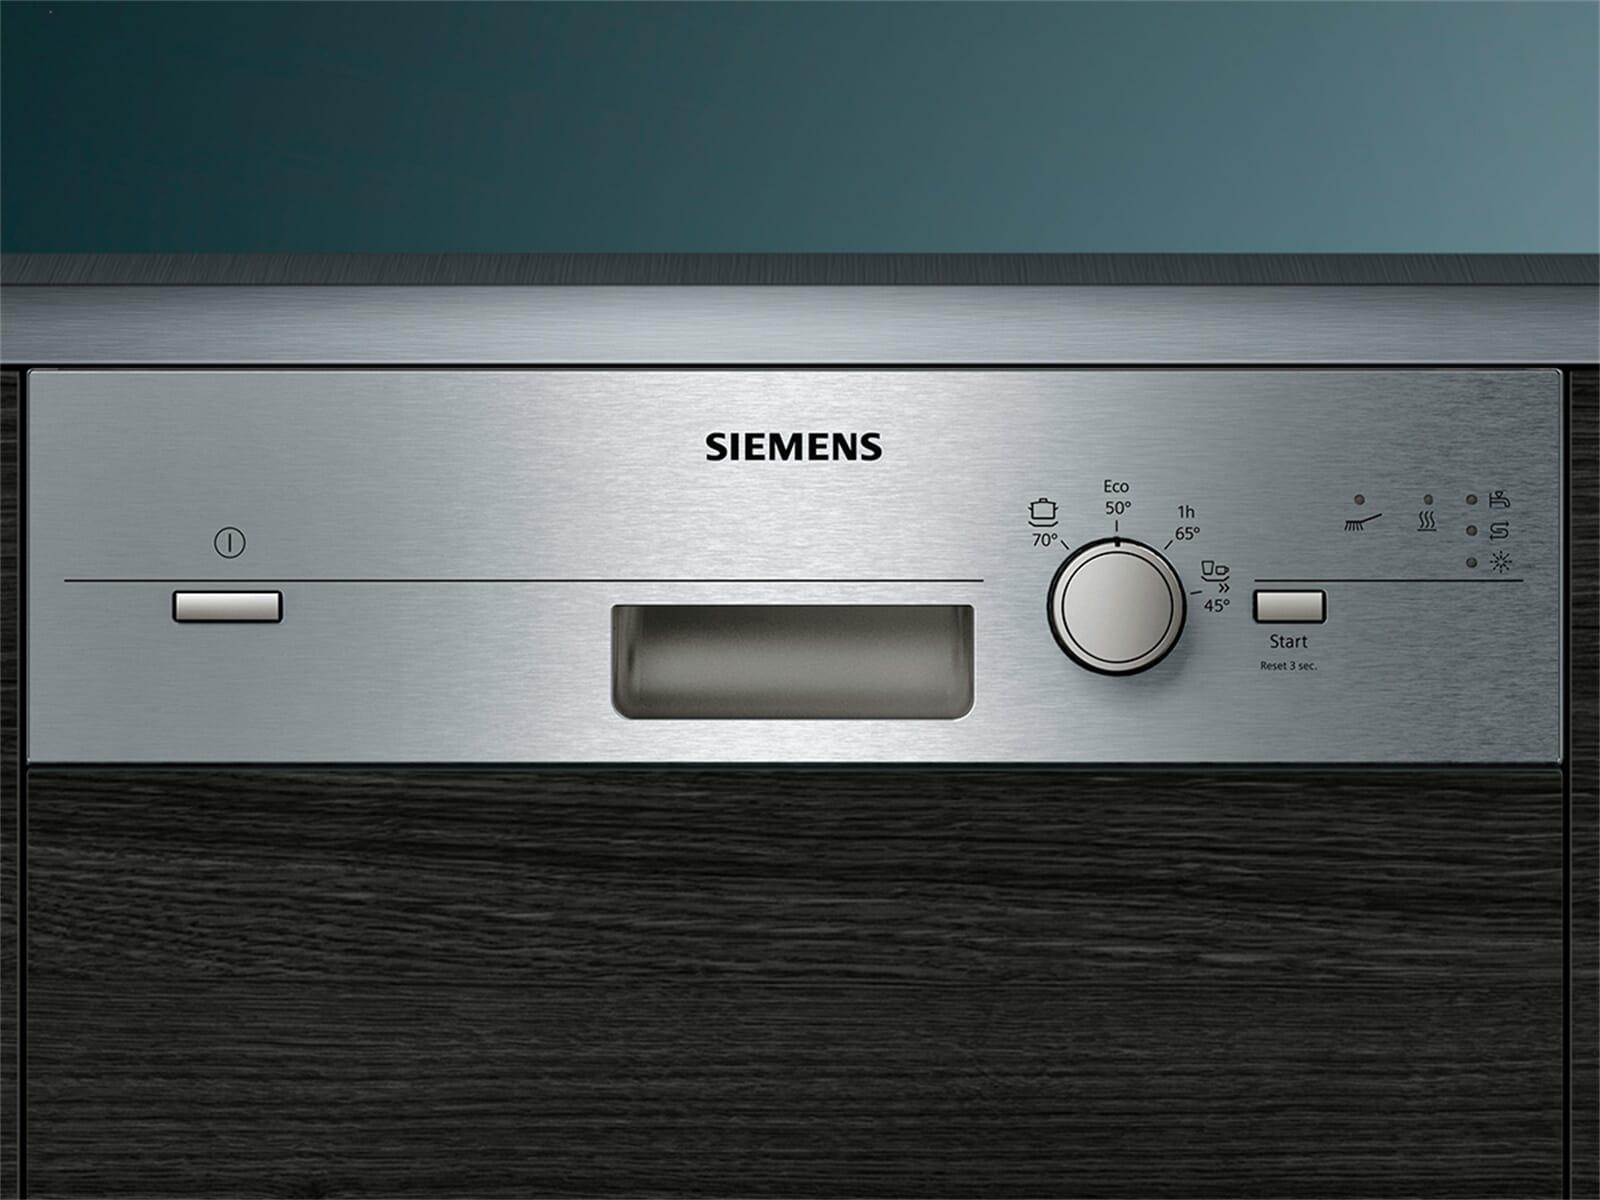 Siemens Kühlschrank Reset : Siemens sr514s00ce teilintegrierbarer einbaugeschirrspüler